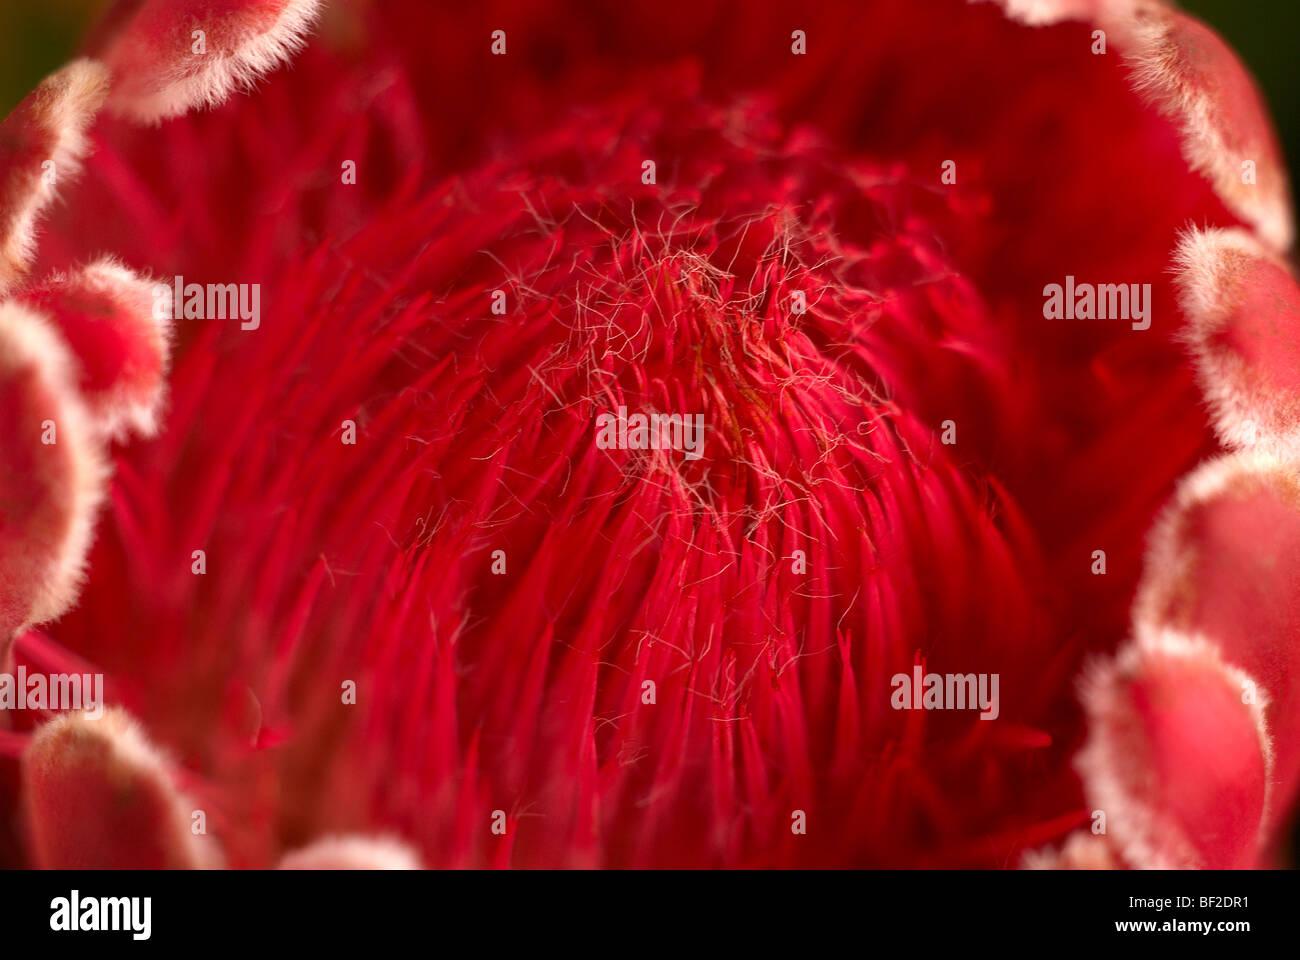 Protea, rot protea, pelzigen protea, Fynbos, Proteacease, südafrikanische Nationalblume Stockbild